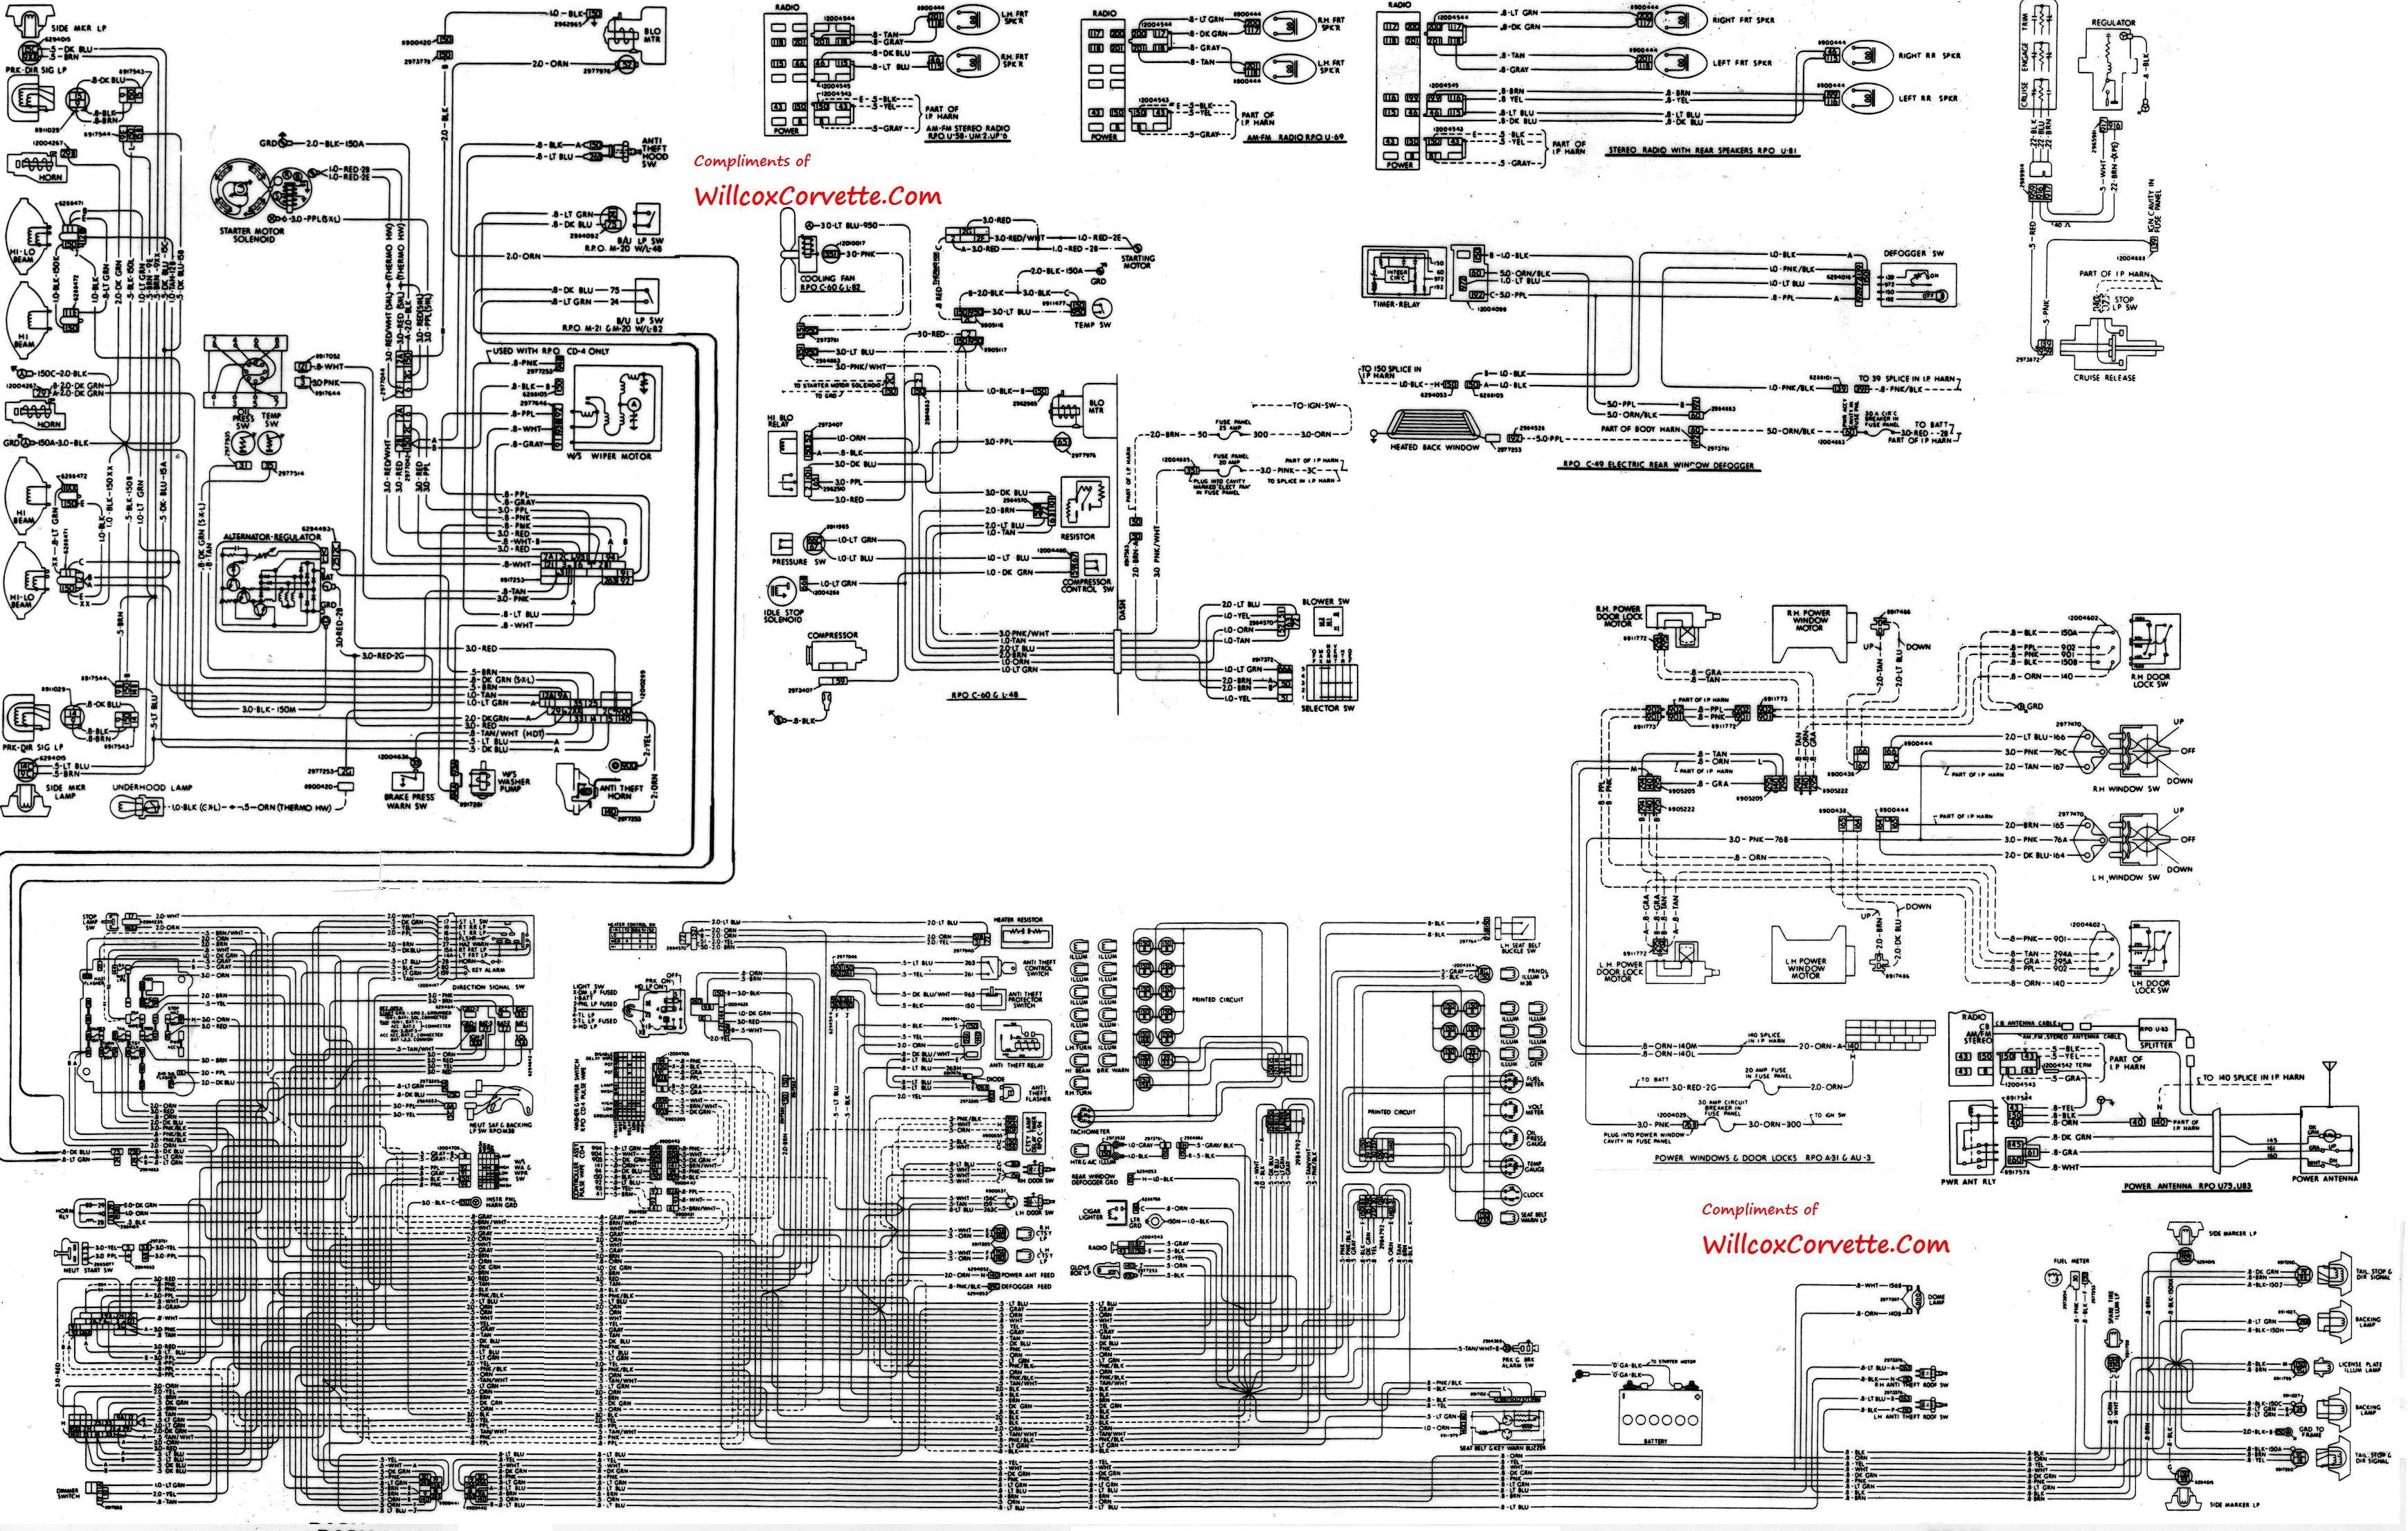 Mercedes Car Wiring Diagram 1979 Wire Diagram and 1975 Corvette Wiring Wiring Diagram Of Mercedes Car Wiring Diagram